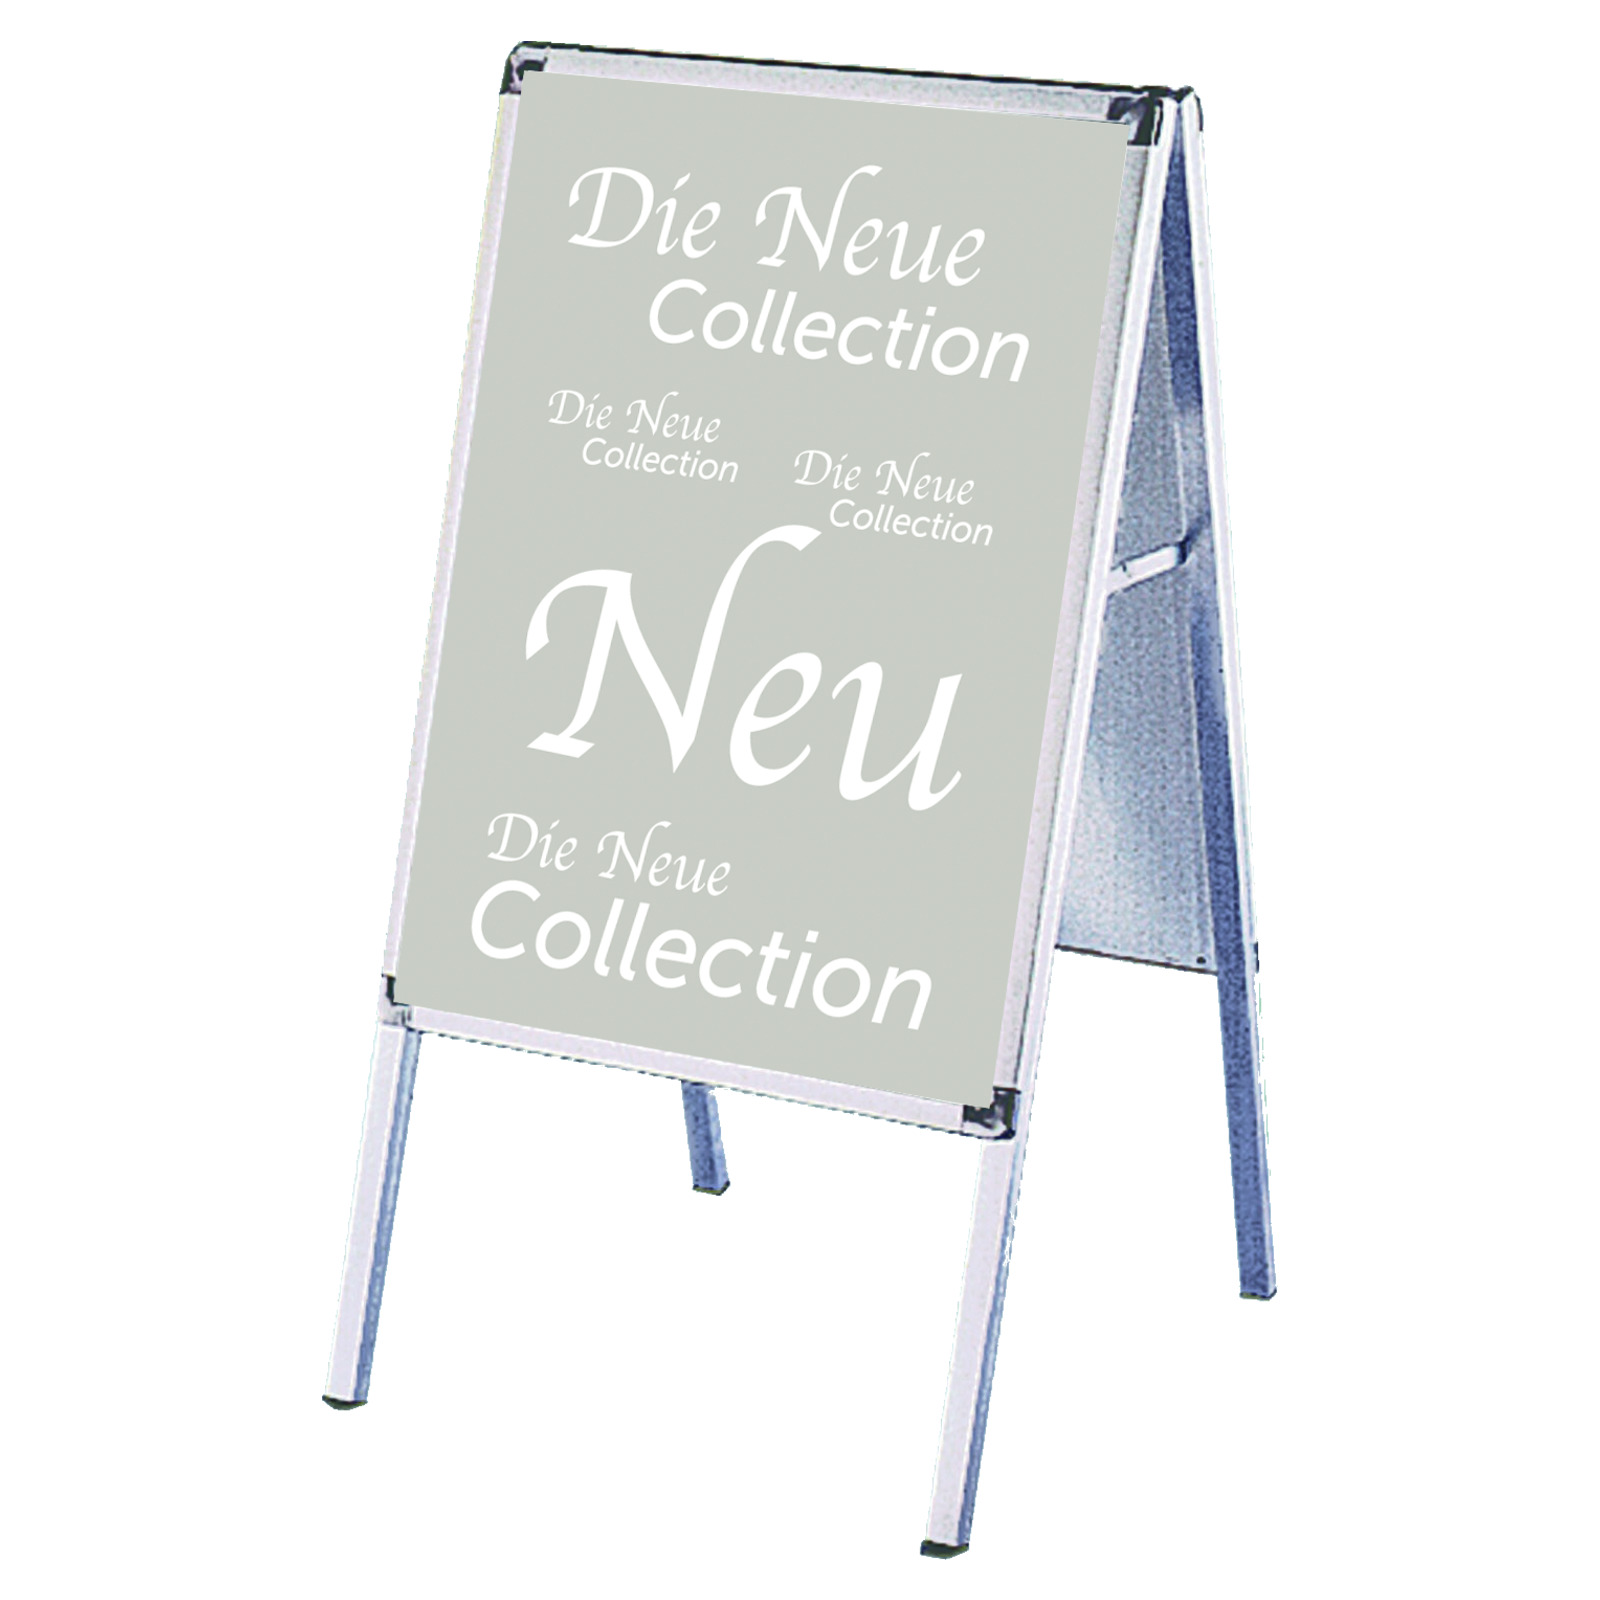 plakat die neue collection 60x85 cm plakate die neue. Black Bedroom Furniture Sets. Home Design Ideas